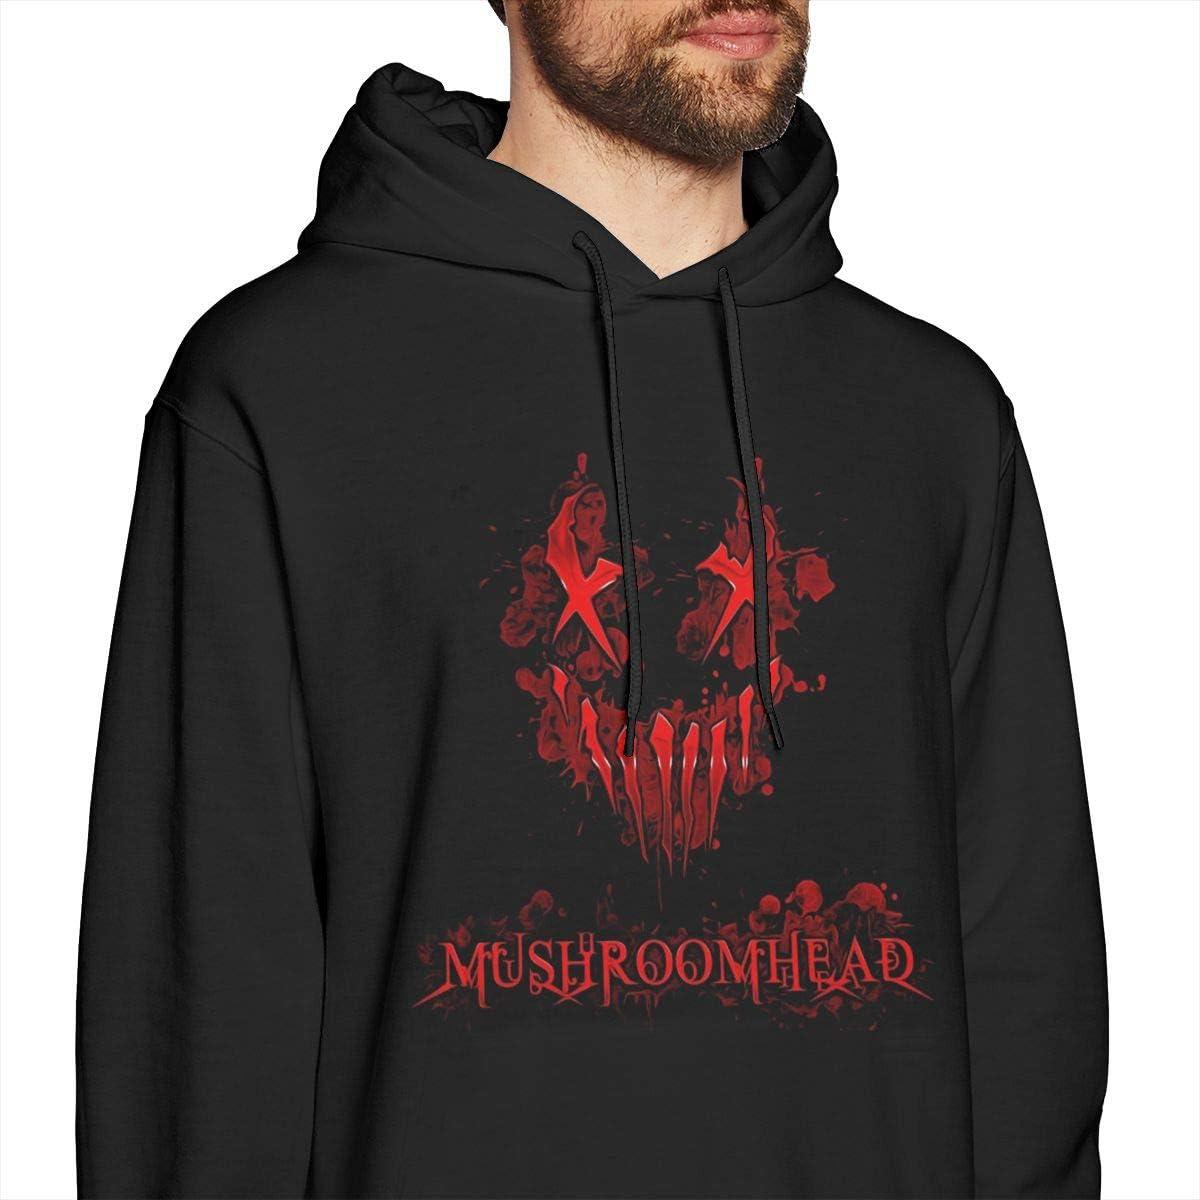 HorseTe Men Sweatshirts Casual Mushroomhead Logo Mens Sweater Black